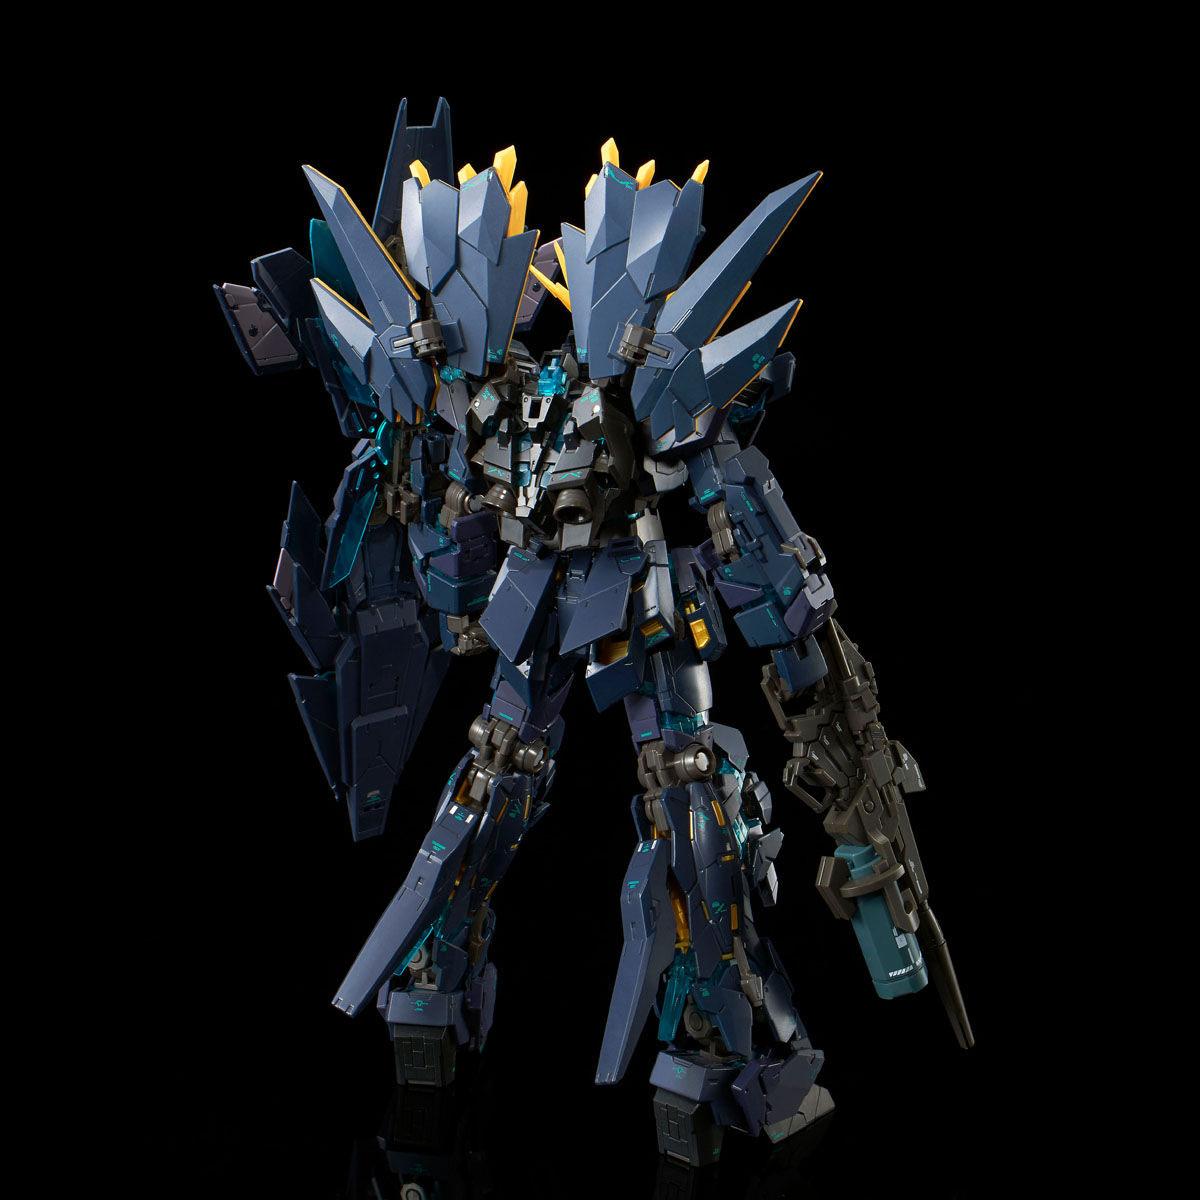 RG 1/144『ユニコーンガンダム2号機 バンシィ・ノルン(最終決戦仕様)』プラモデル-003